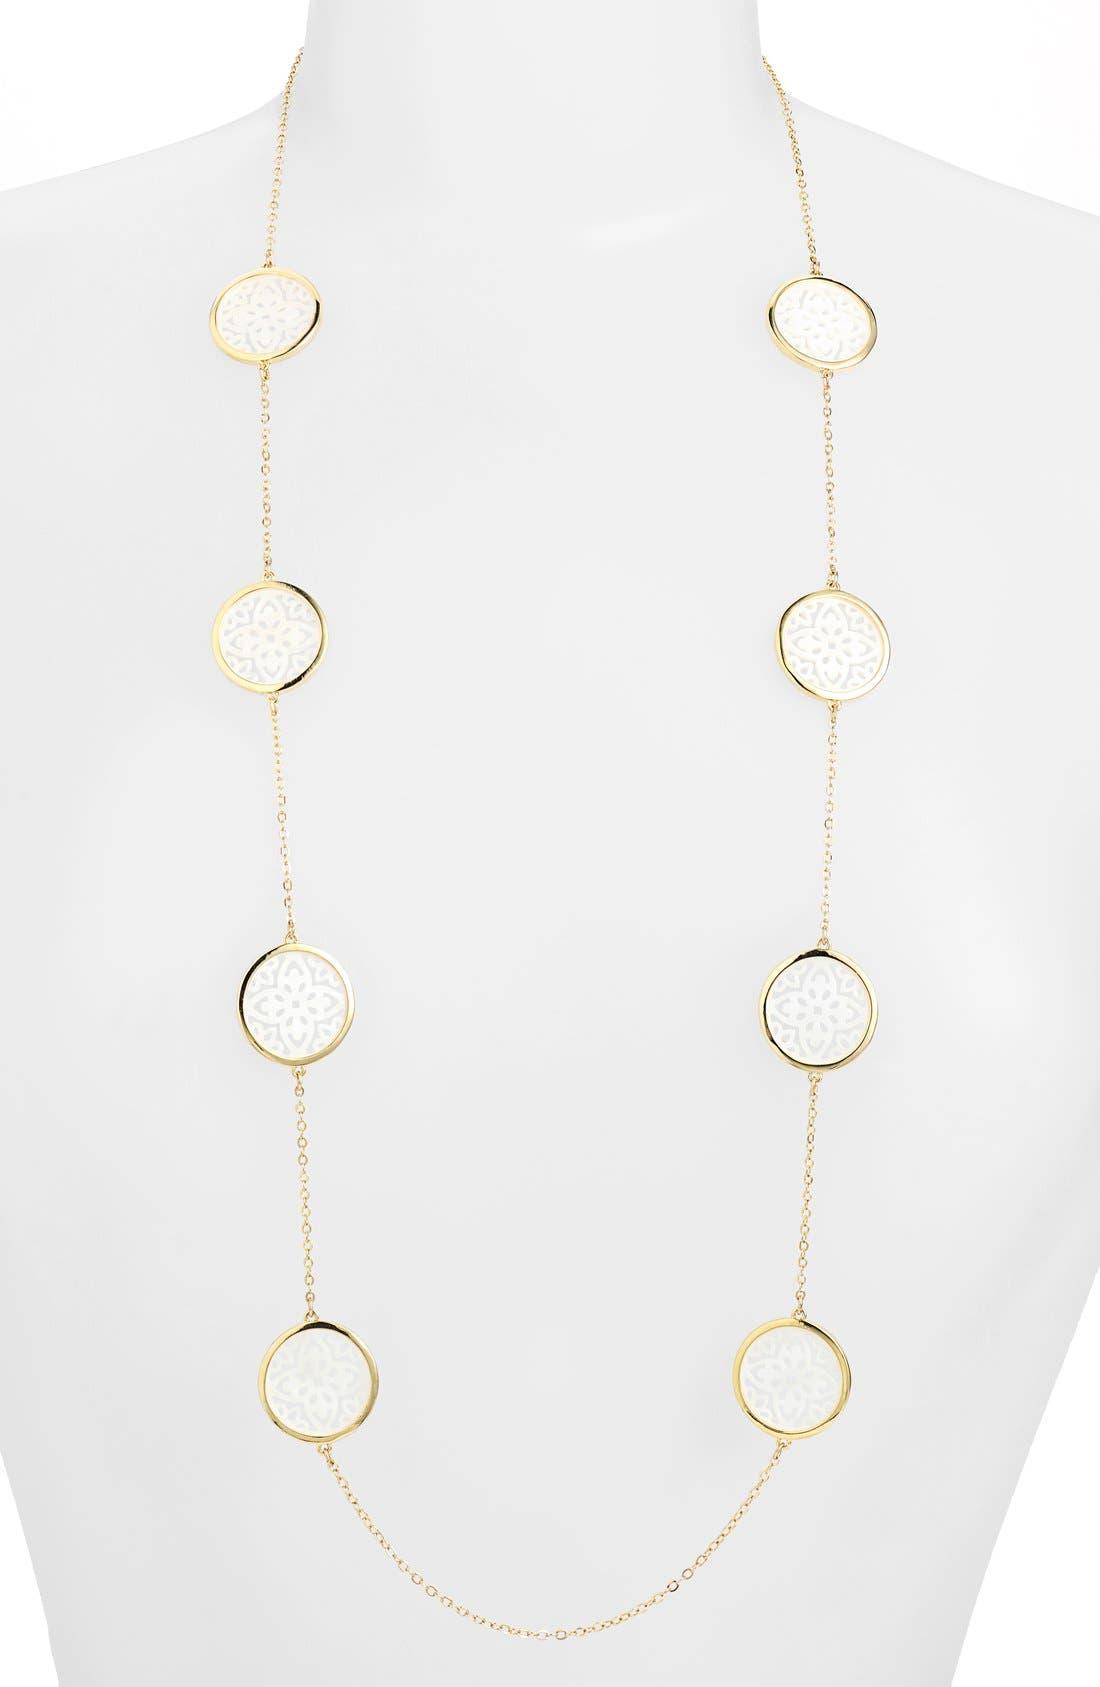 Alternate Image 1 Selected - Lauren Ralph Lauren Long Illusion Necklace